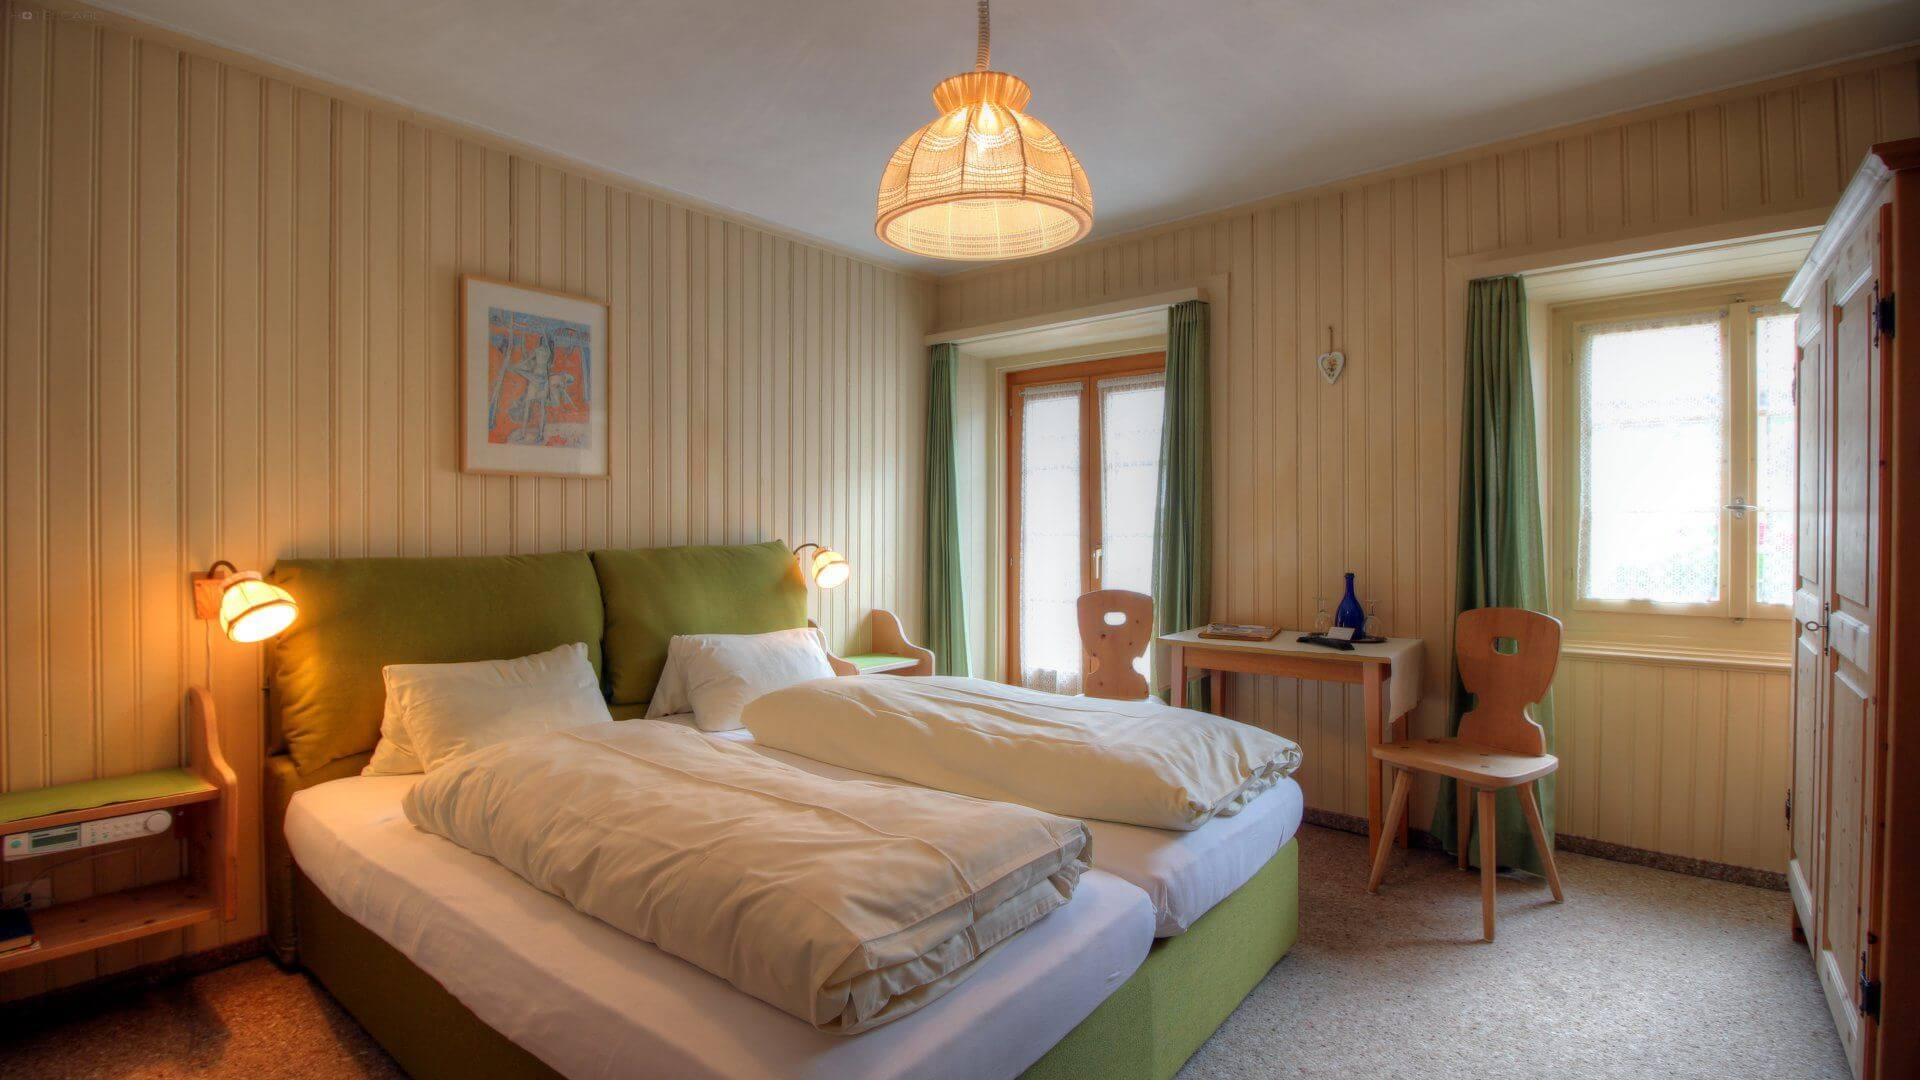 3-tage-im-hotel-alpina-im-val-mustair